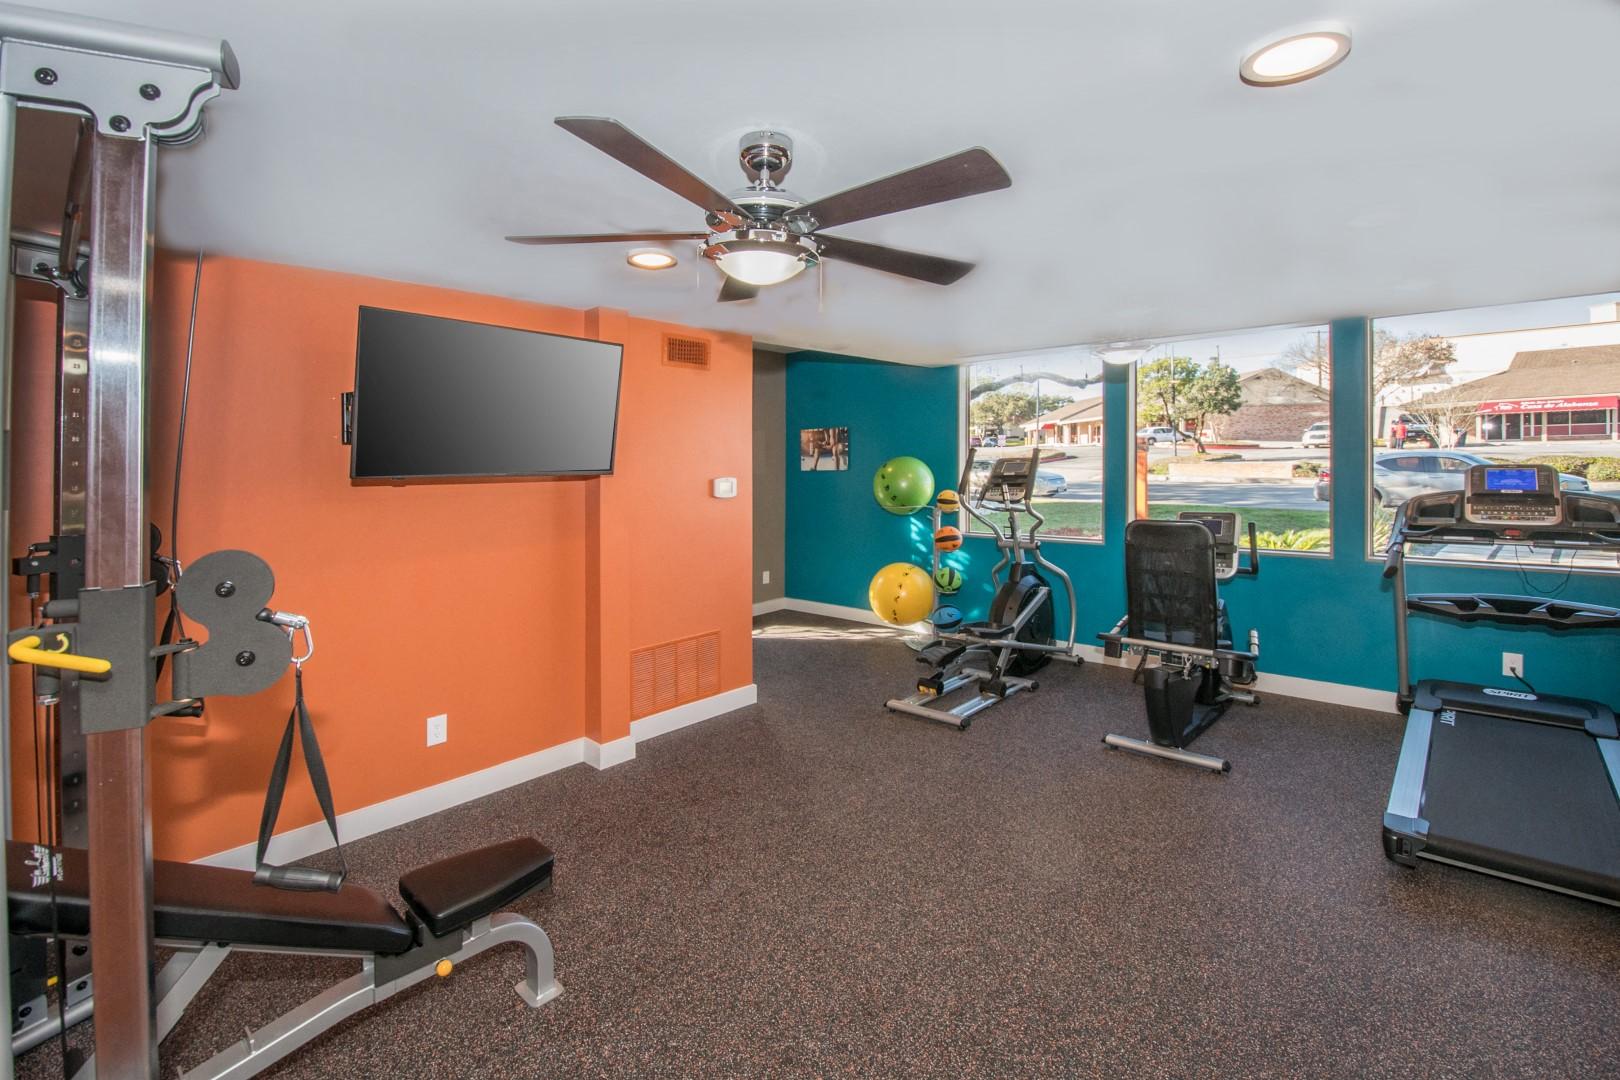 northwest san antonio apartments with fitness center